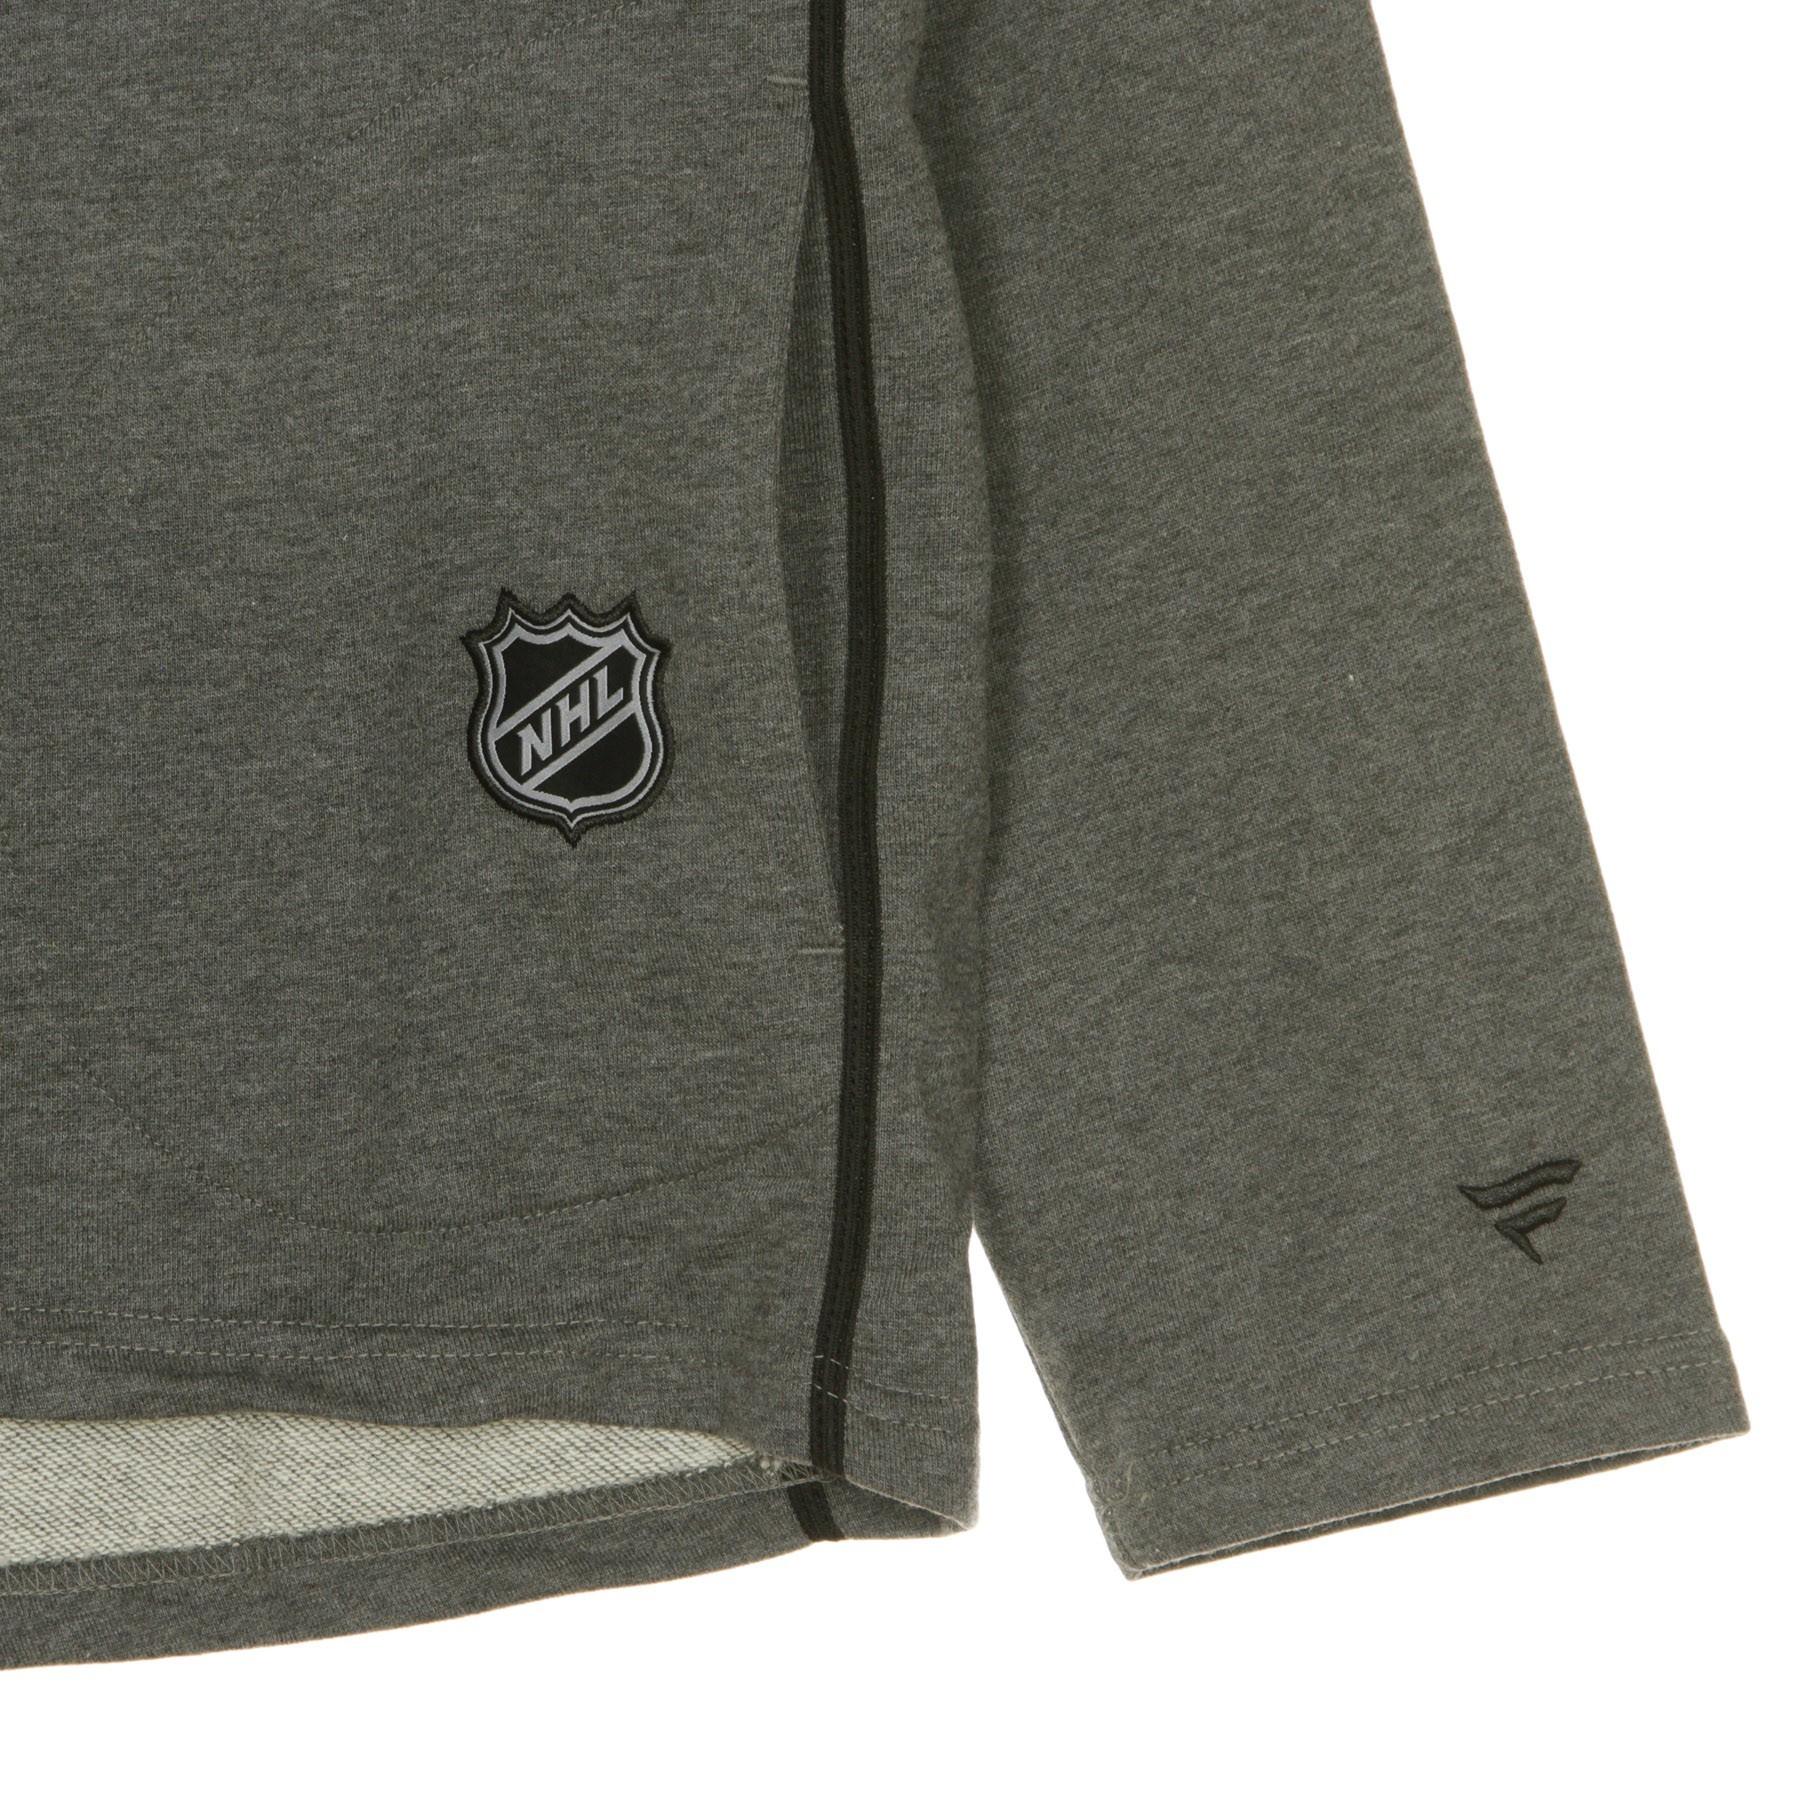 FELPA LEGGERA CAPPUCCIO NHL FRANCHISE OVERHEAD HOODIE VEGKNI M